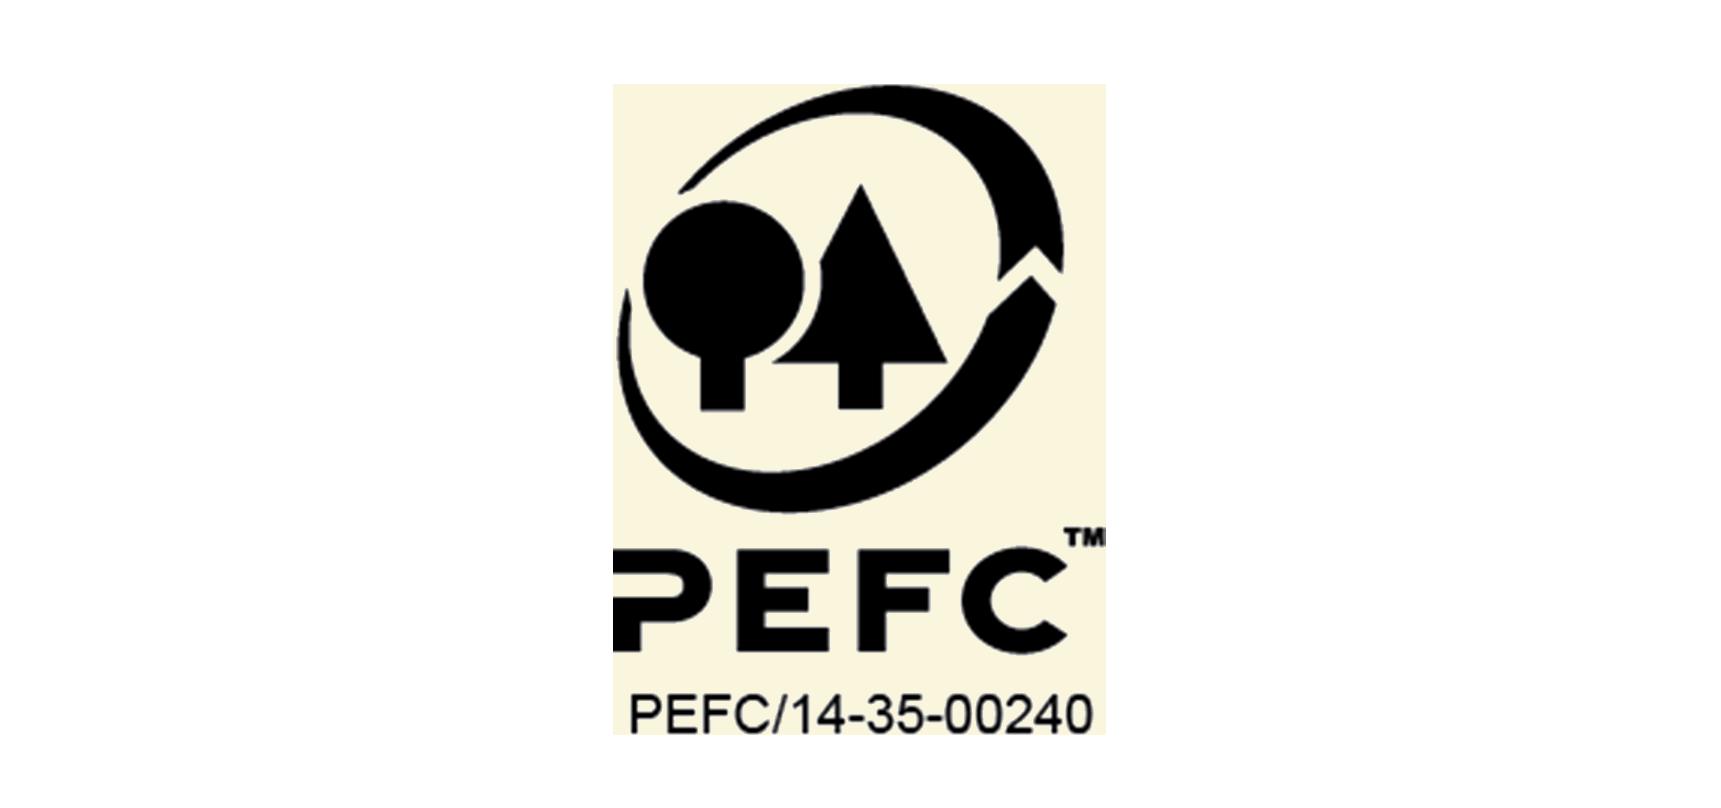 Logos carrusel_PEFC